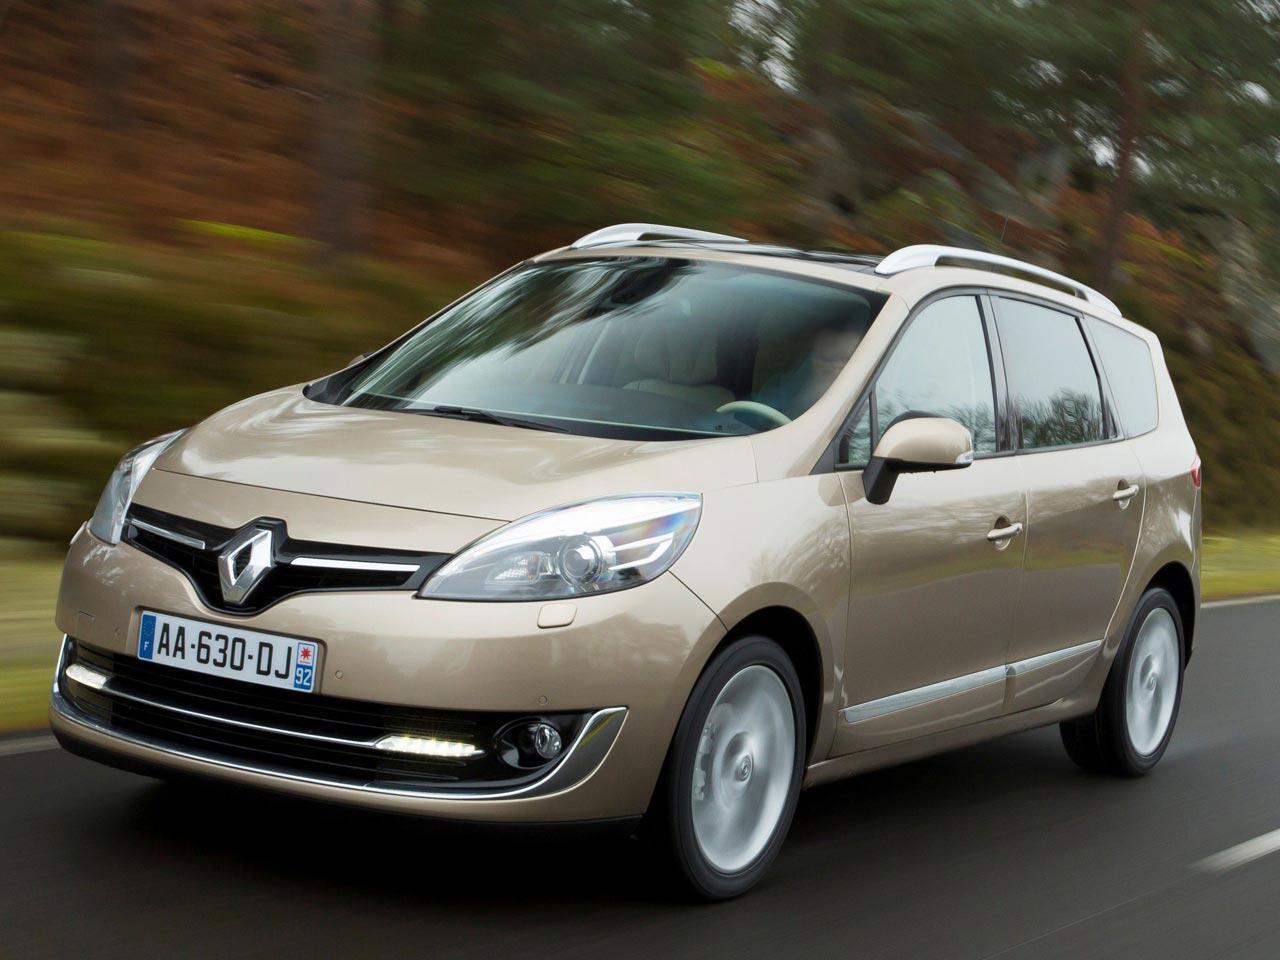 Bild zu 6. Platz: Renault Grand Scenic